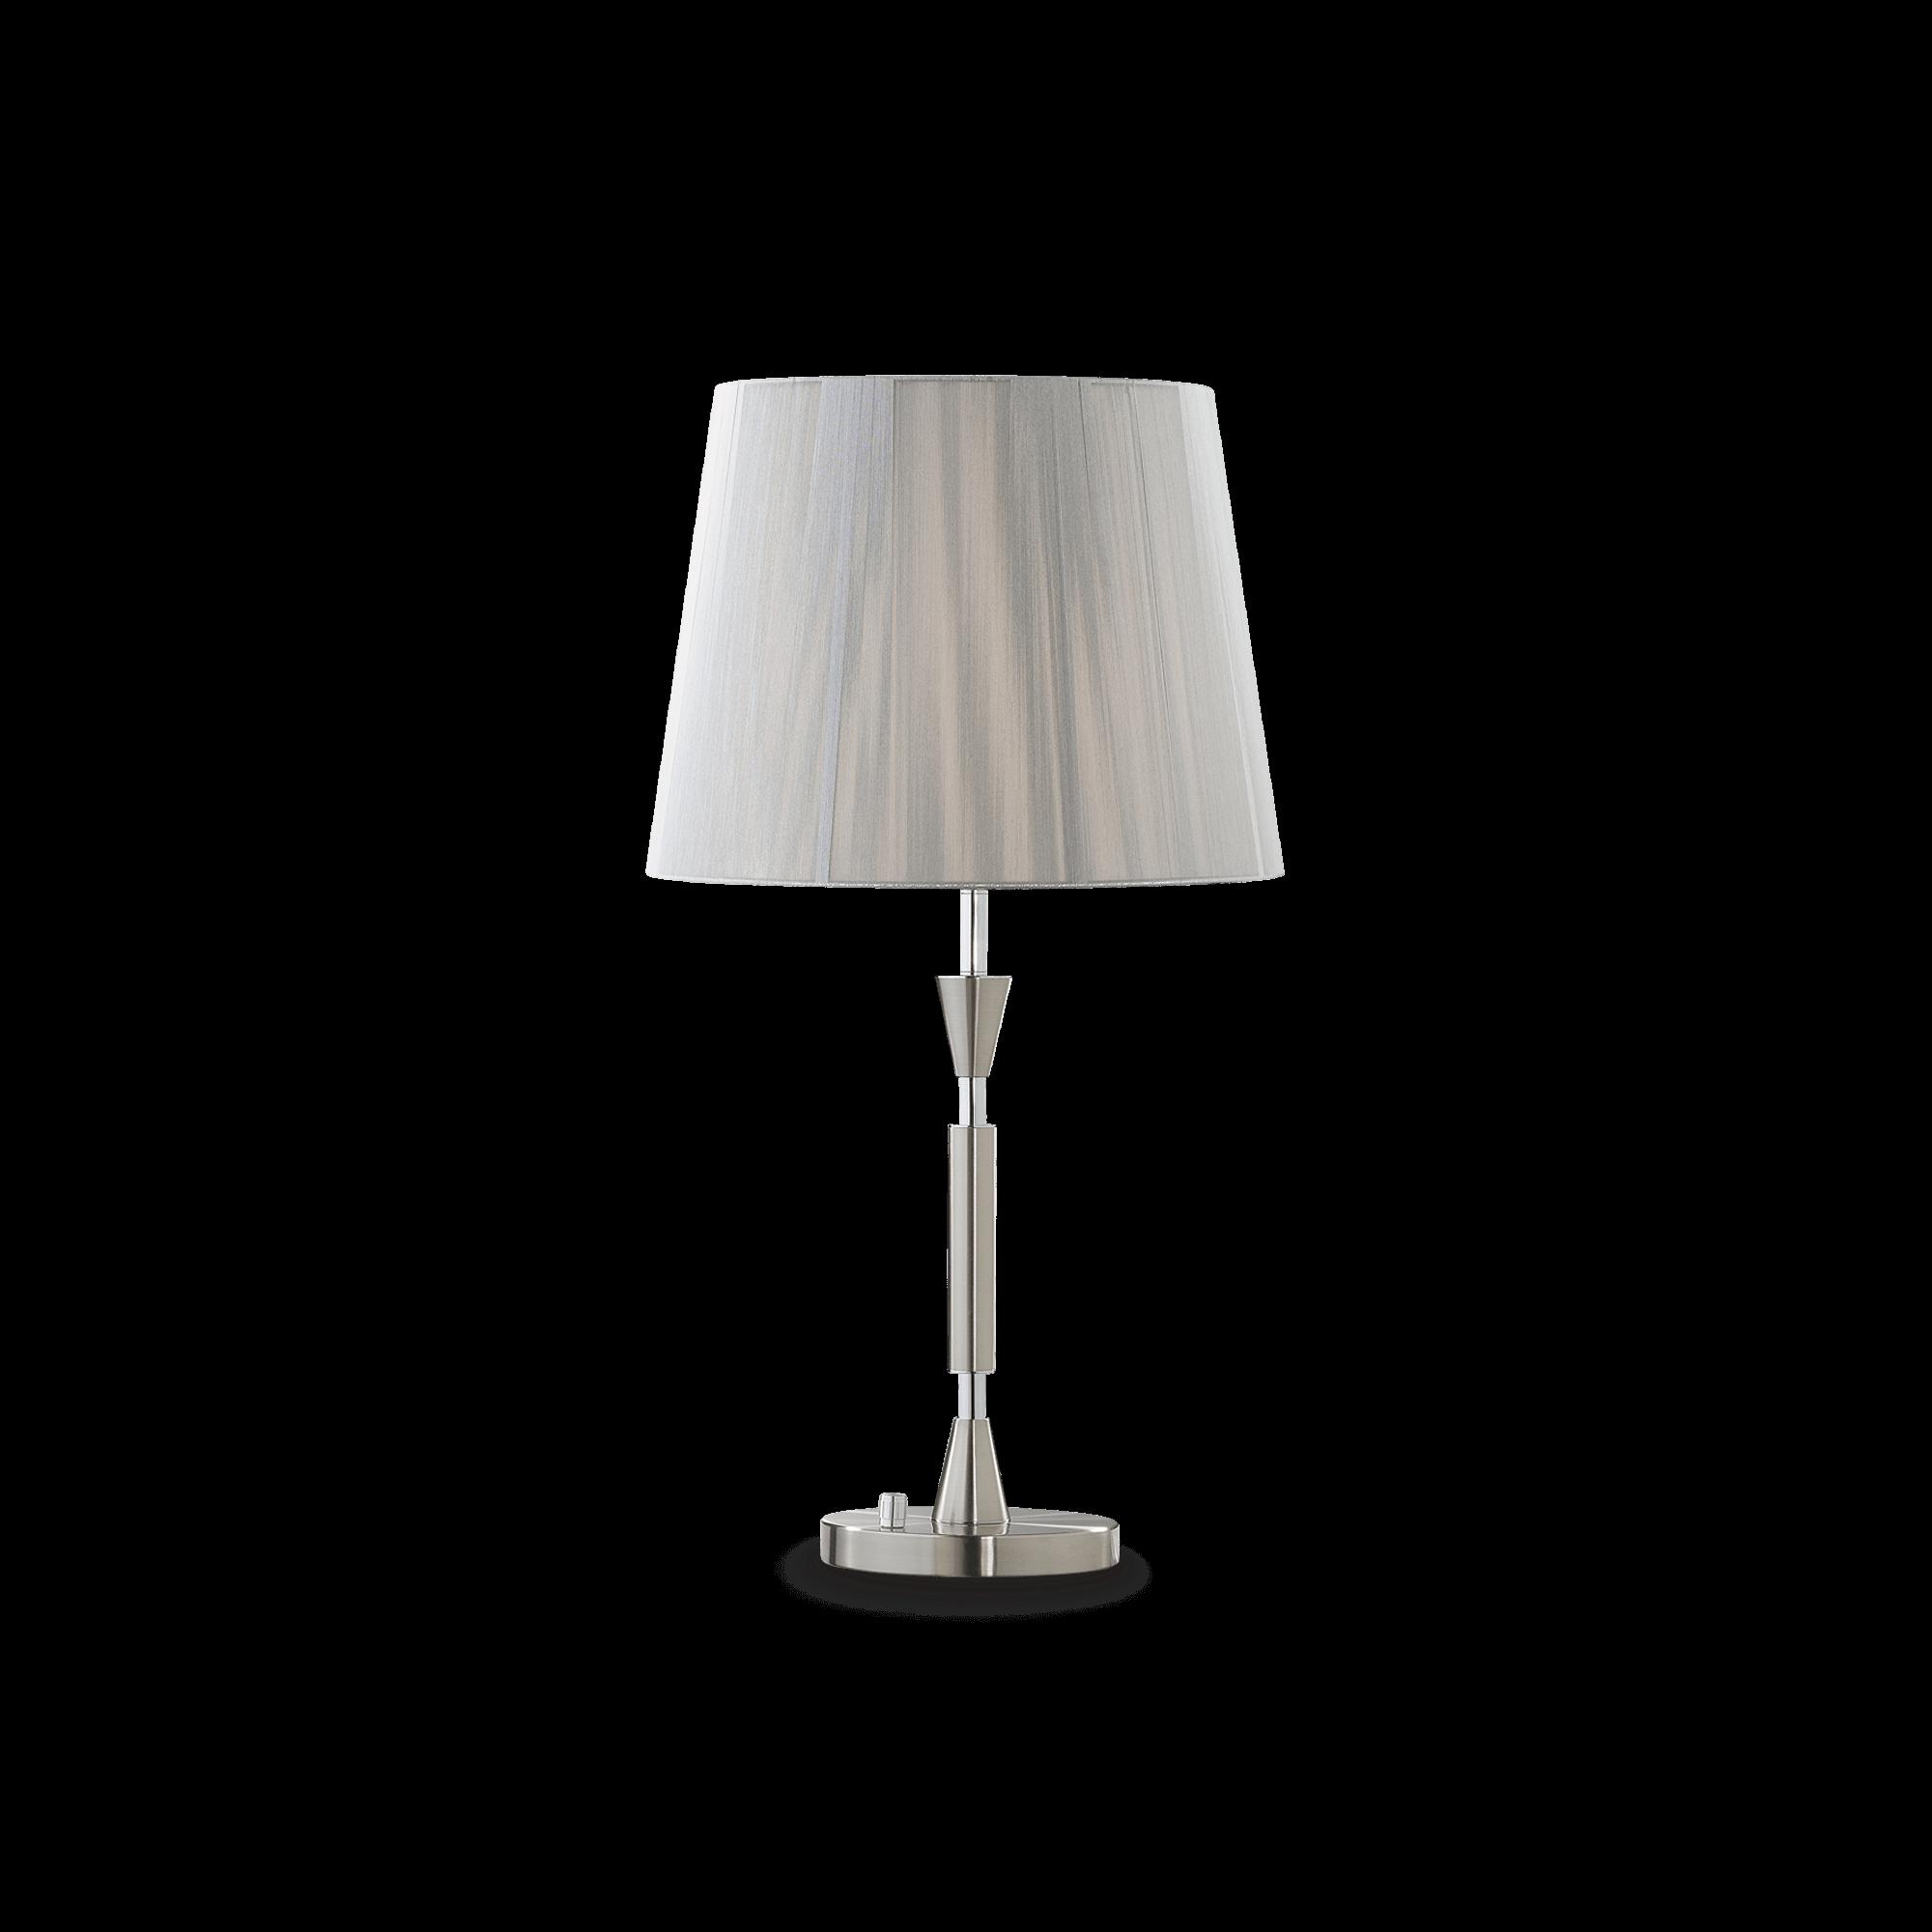 IDEAL LUX LAMPADA DA TAVOLO PARIS TL1 BIG